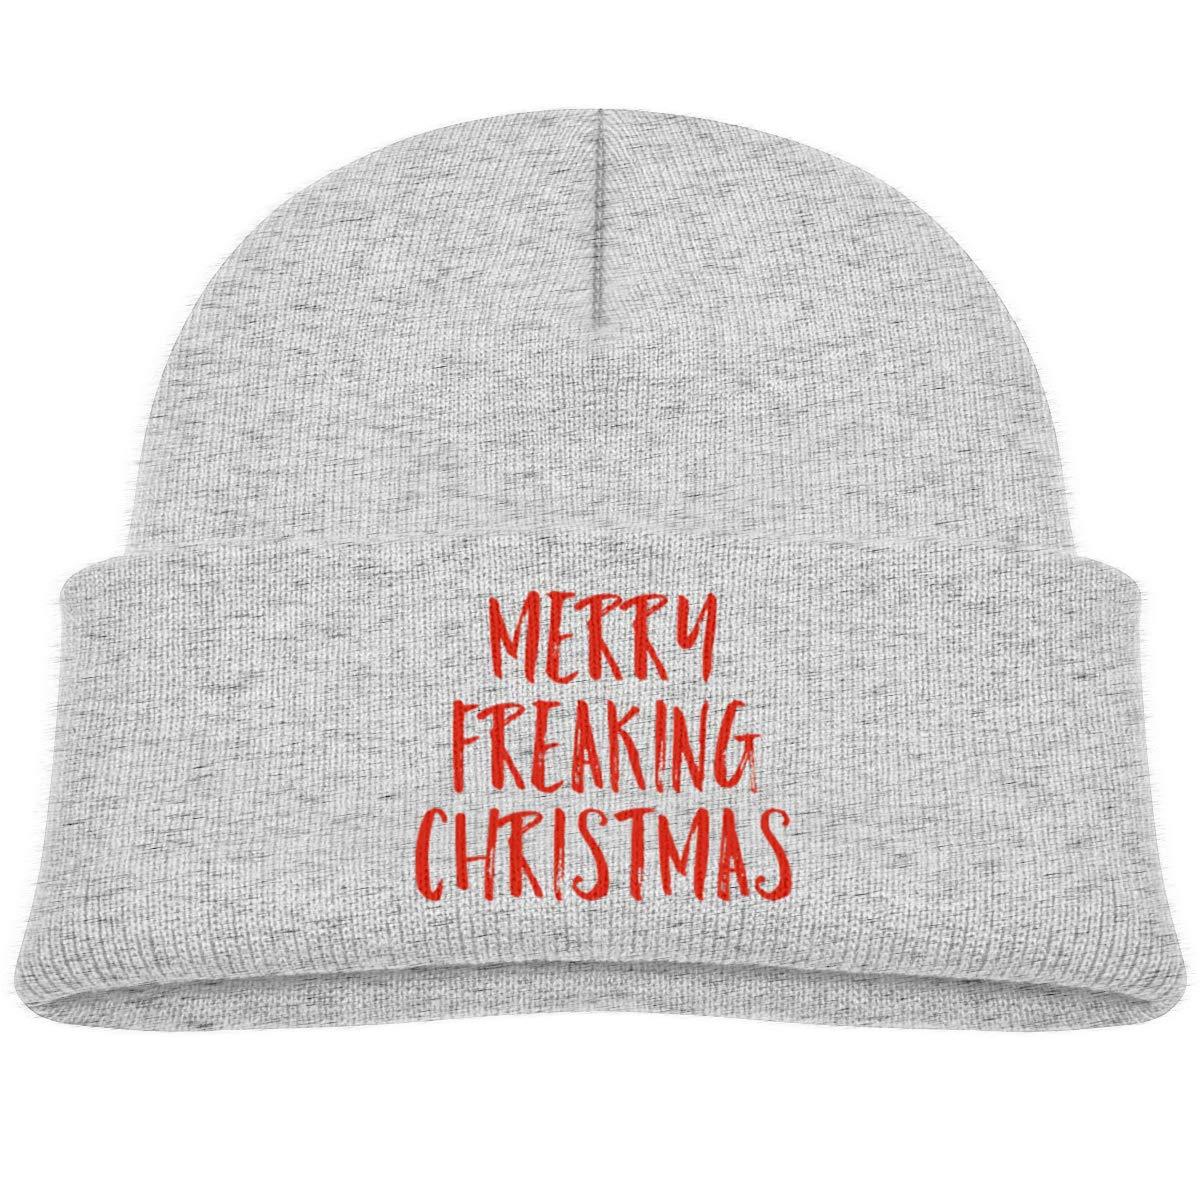 Hanfjj Kefdk Merry Freaking Christmas Infant Knit Hats Kids Beanie Cap